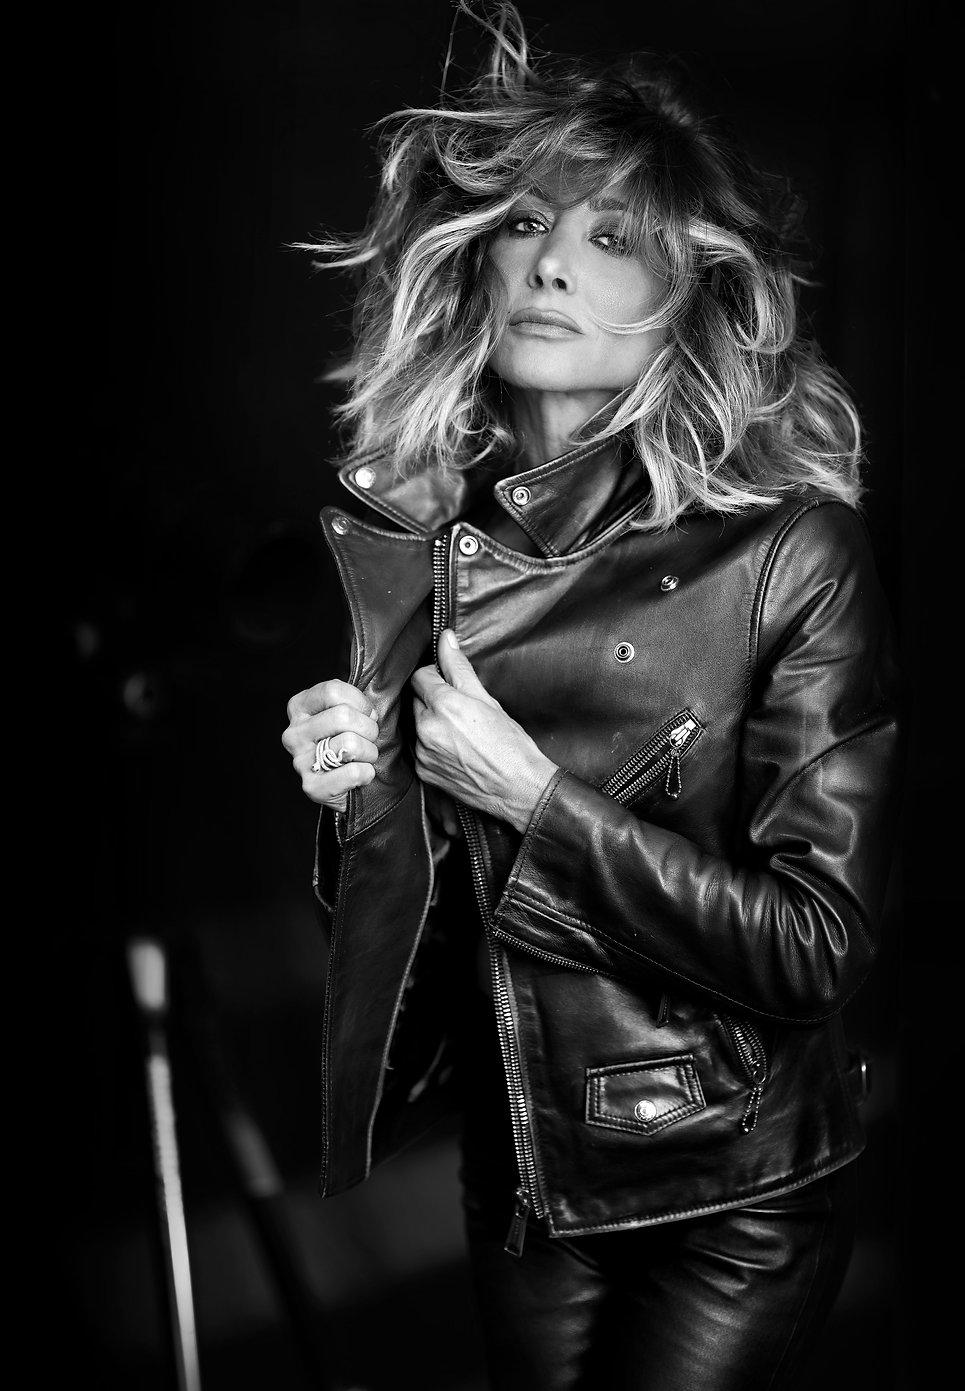 leather,jacket,sensual,bnw,blondhair,eyes,fashion,magazine,corsant-colat,frenchphotographer